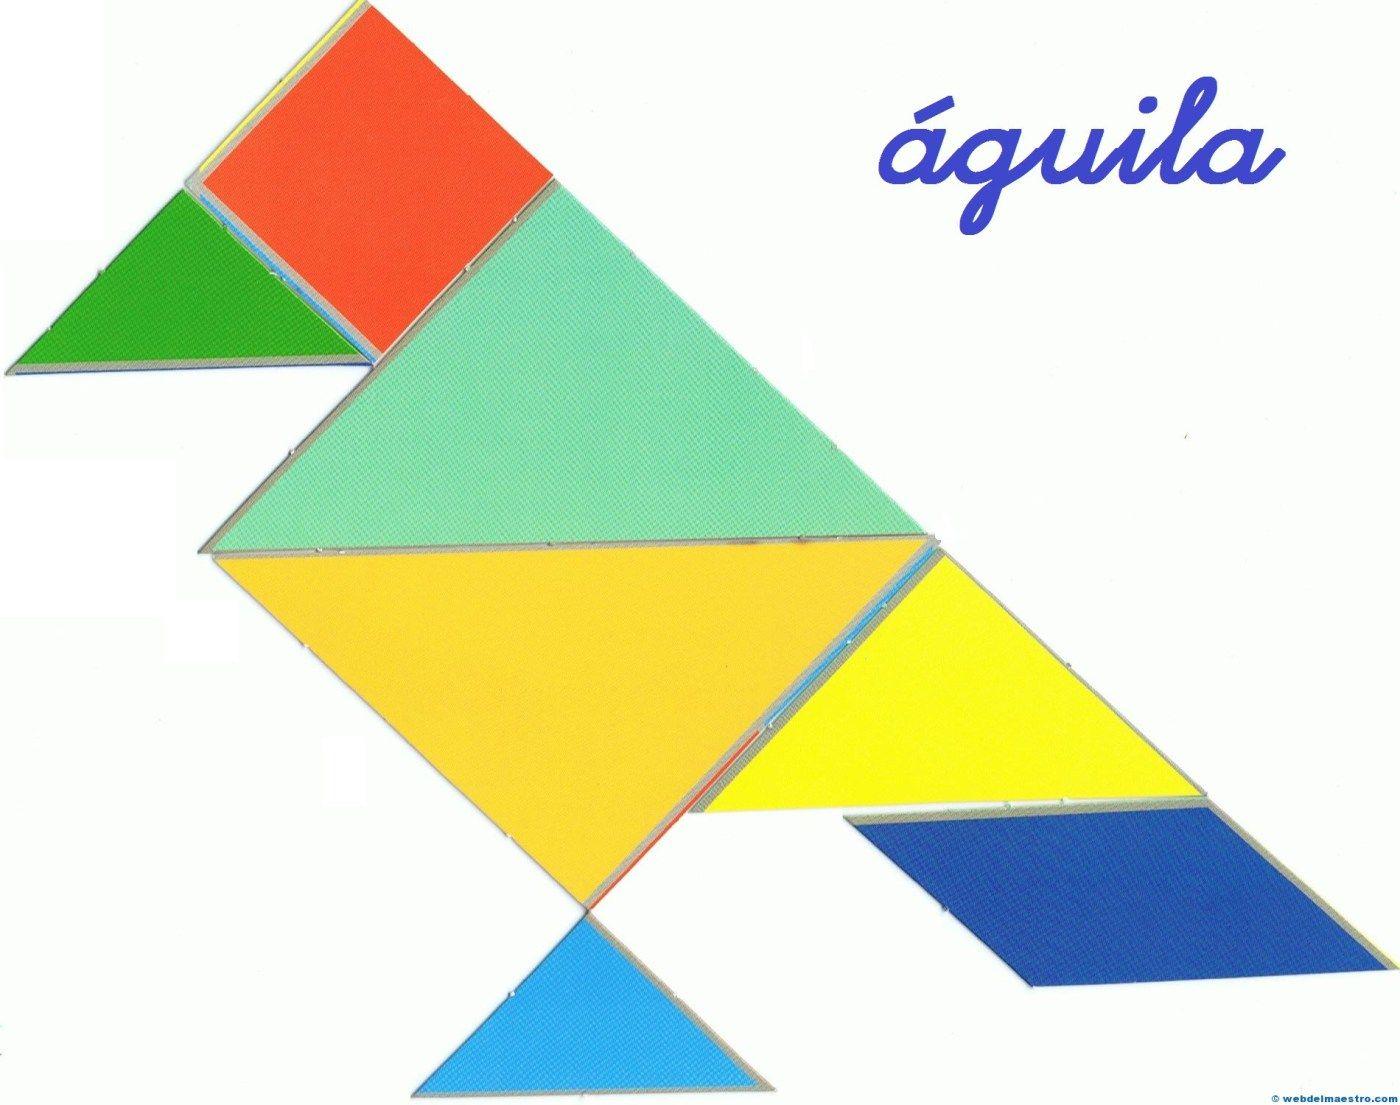 tangram  figuras para imprimir online pretendo facilitar informaci u00f3n y aportar material solution manual chemistry zumdahl solution manual chemical kinetics